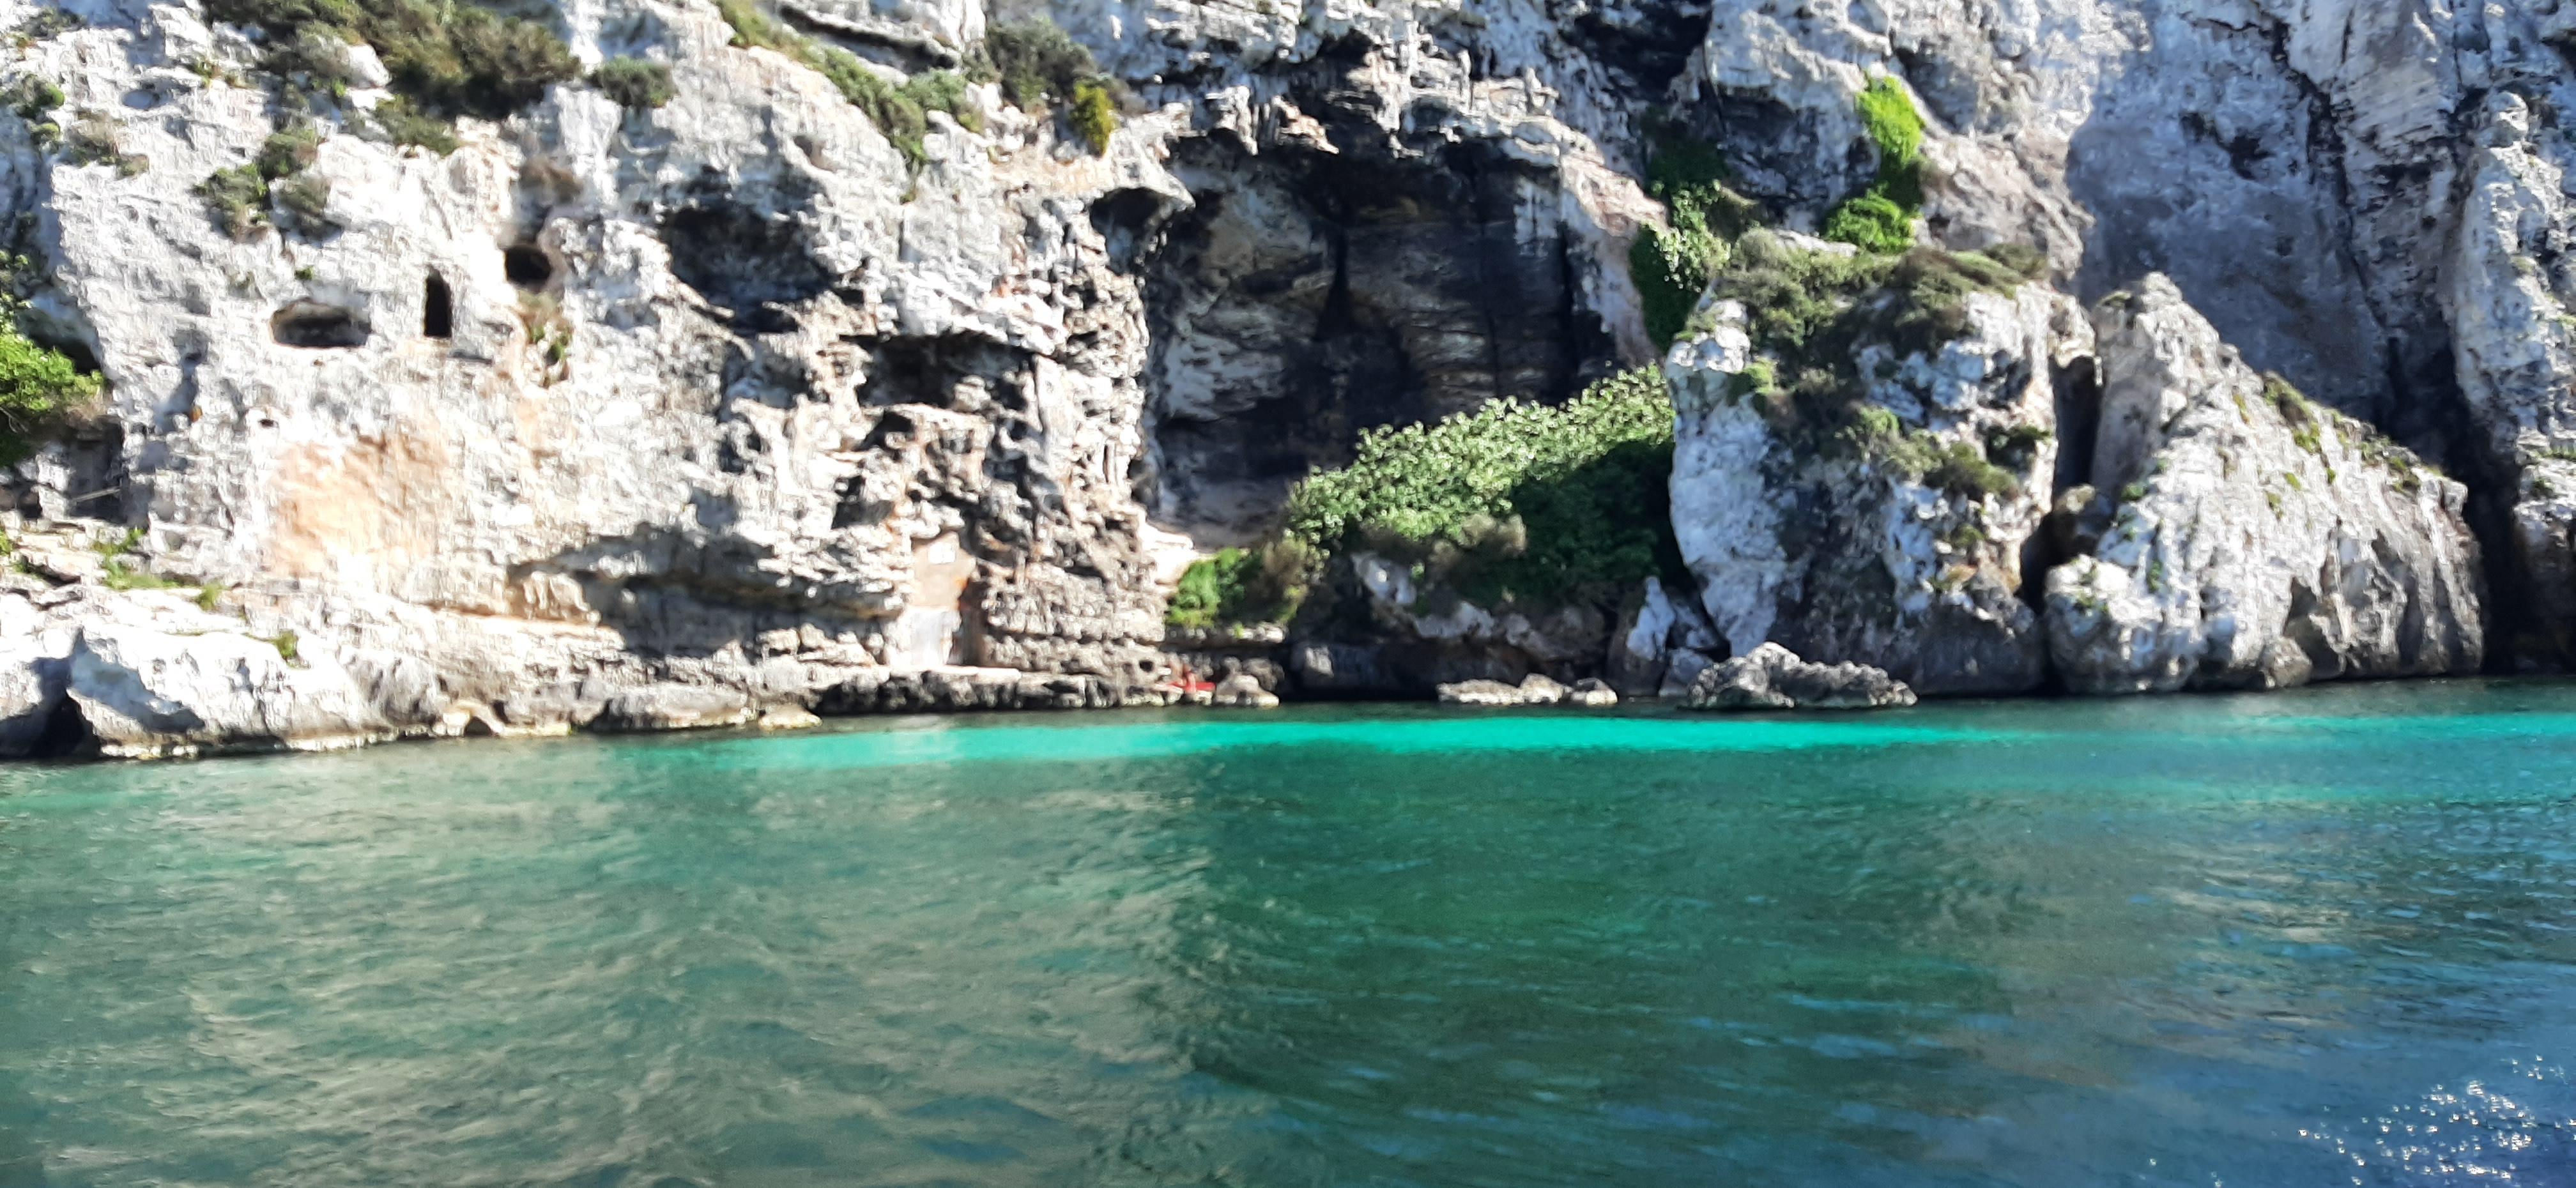 Cales Coves, Menorca, 4 mayo 2021